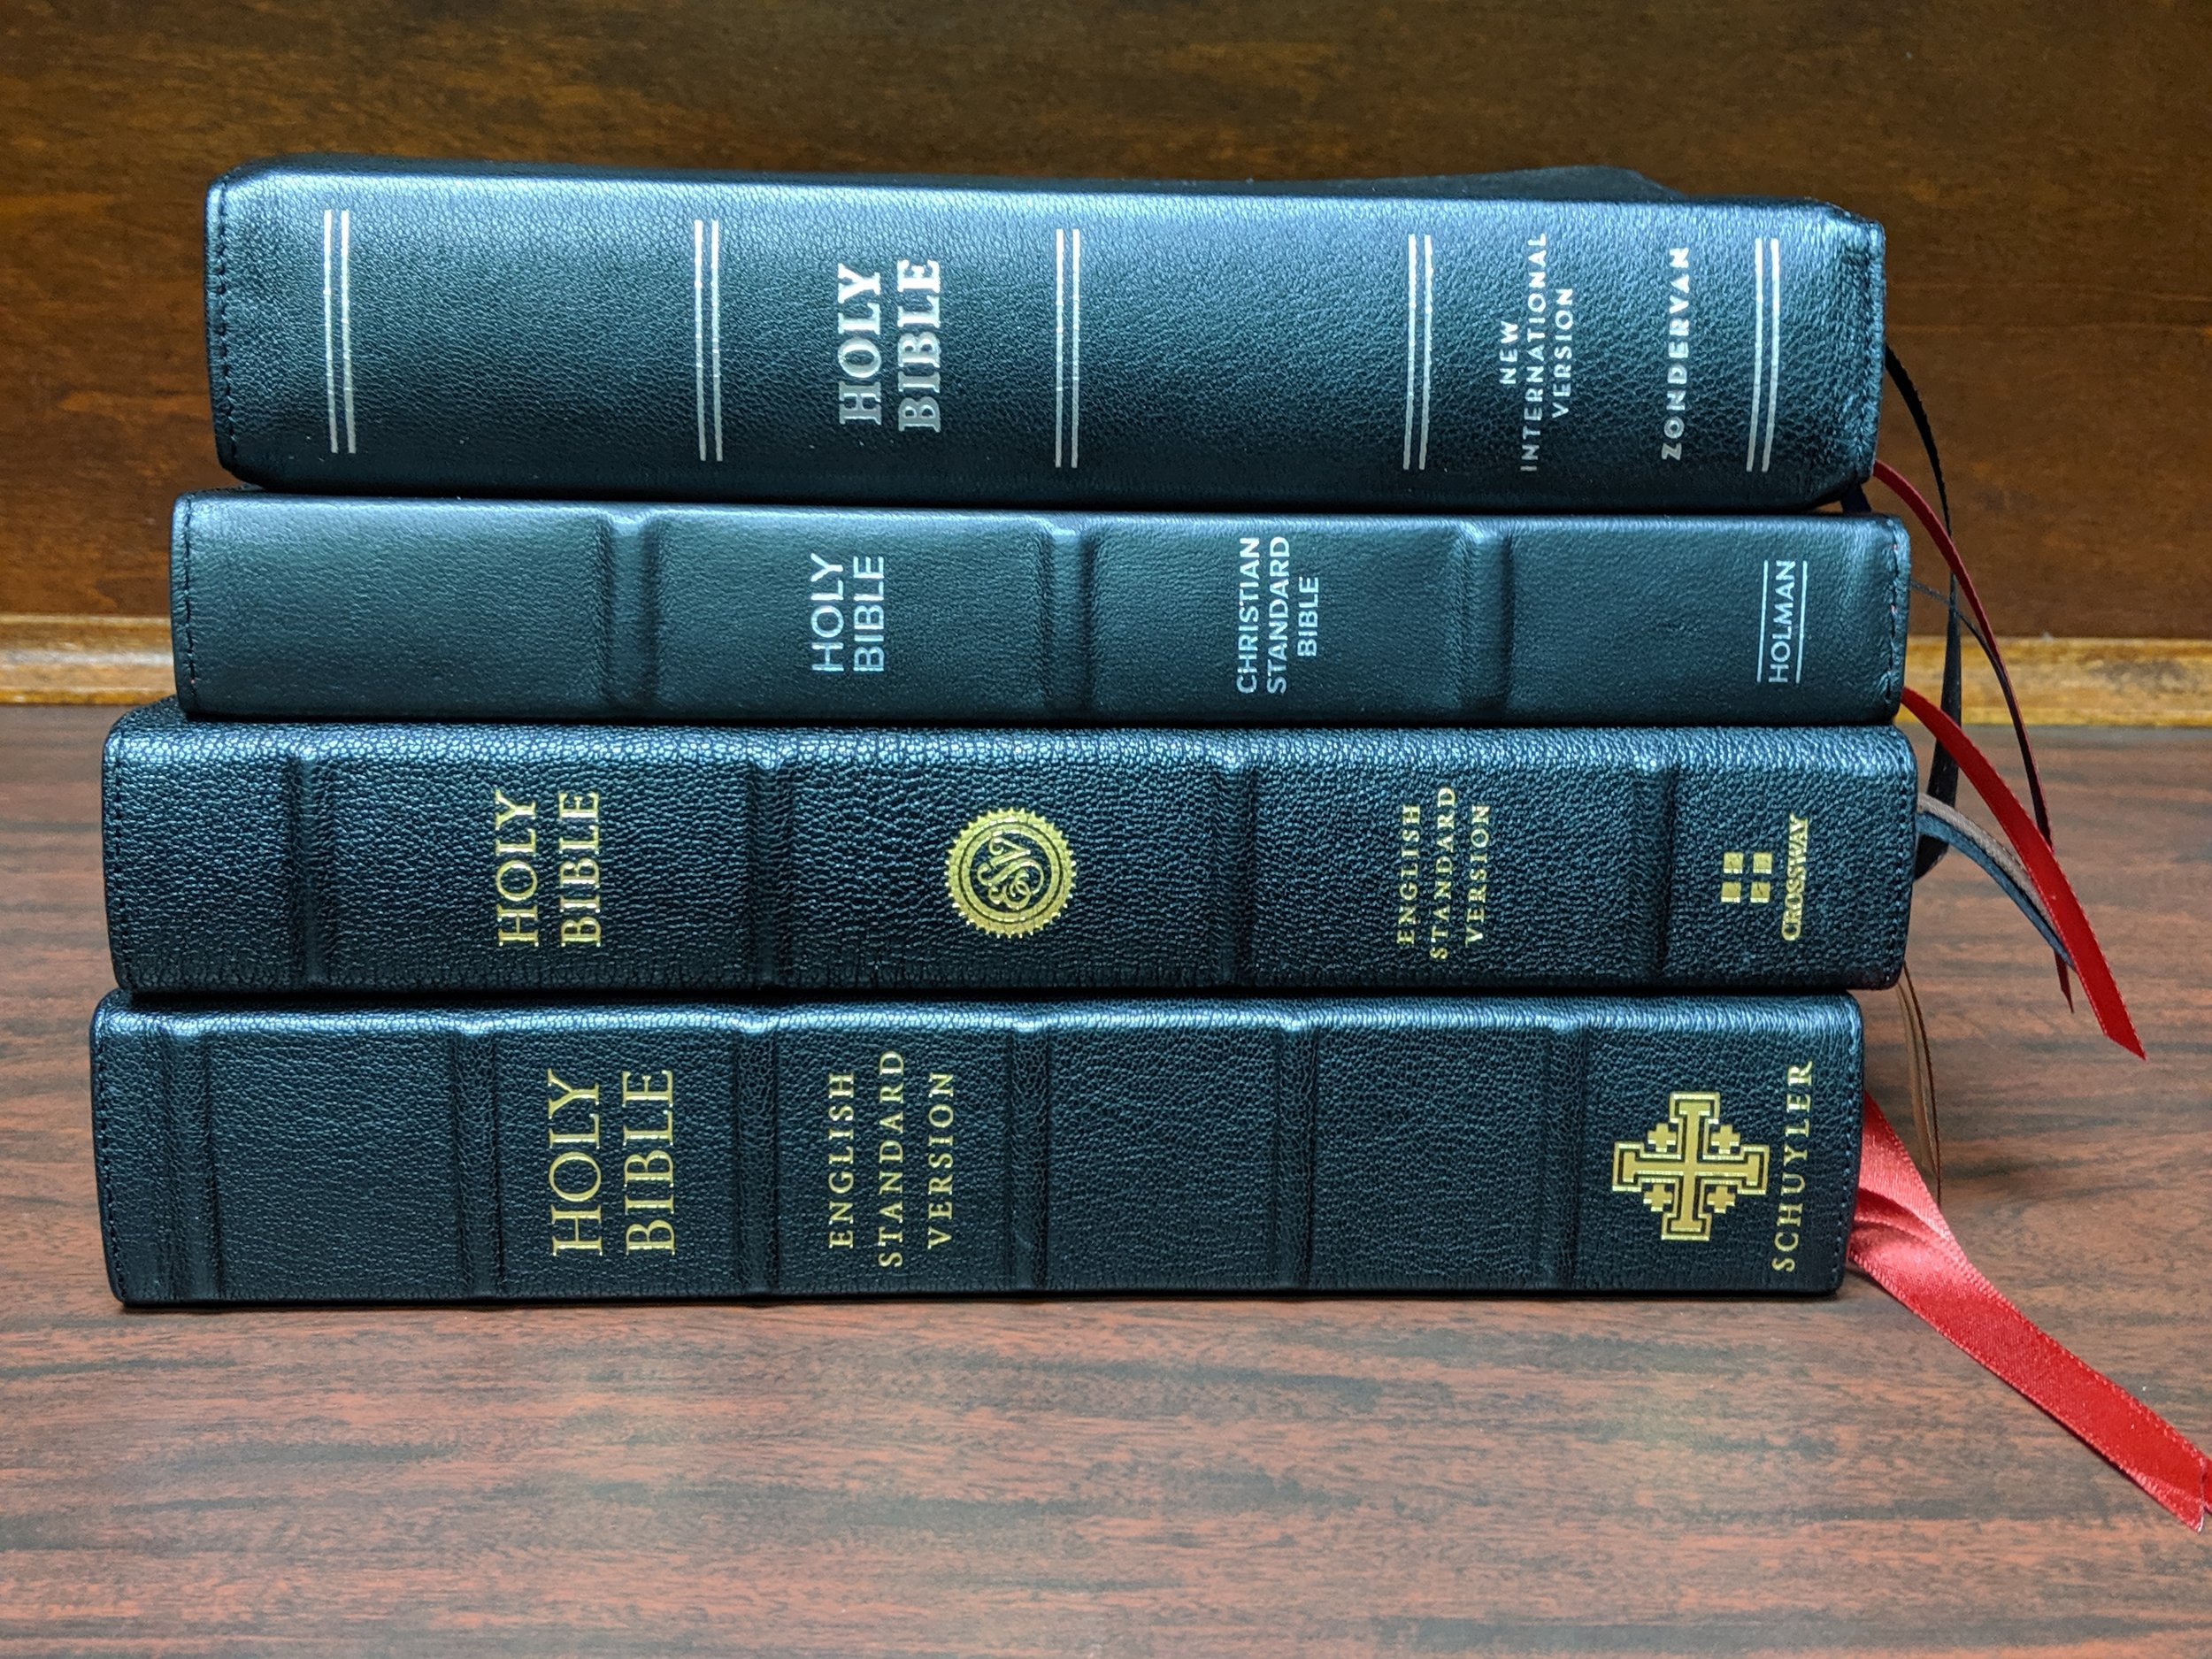 top to bottom: NIV Premier, CSB Large Print Ultra Thin, ESV Heirloom Legacy, Schuyler Credo Quentel